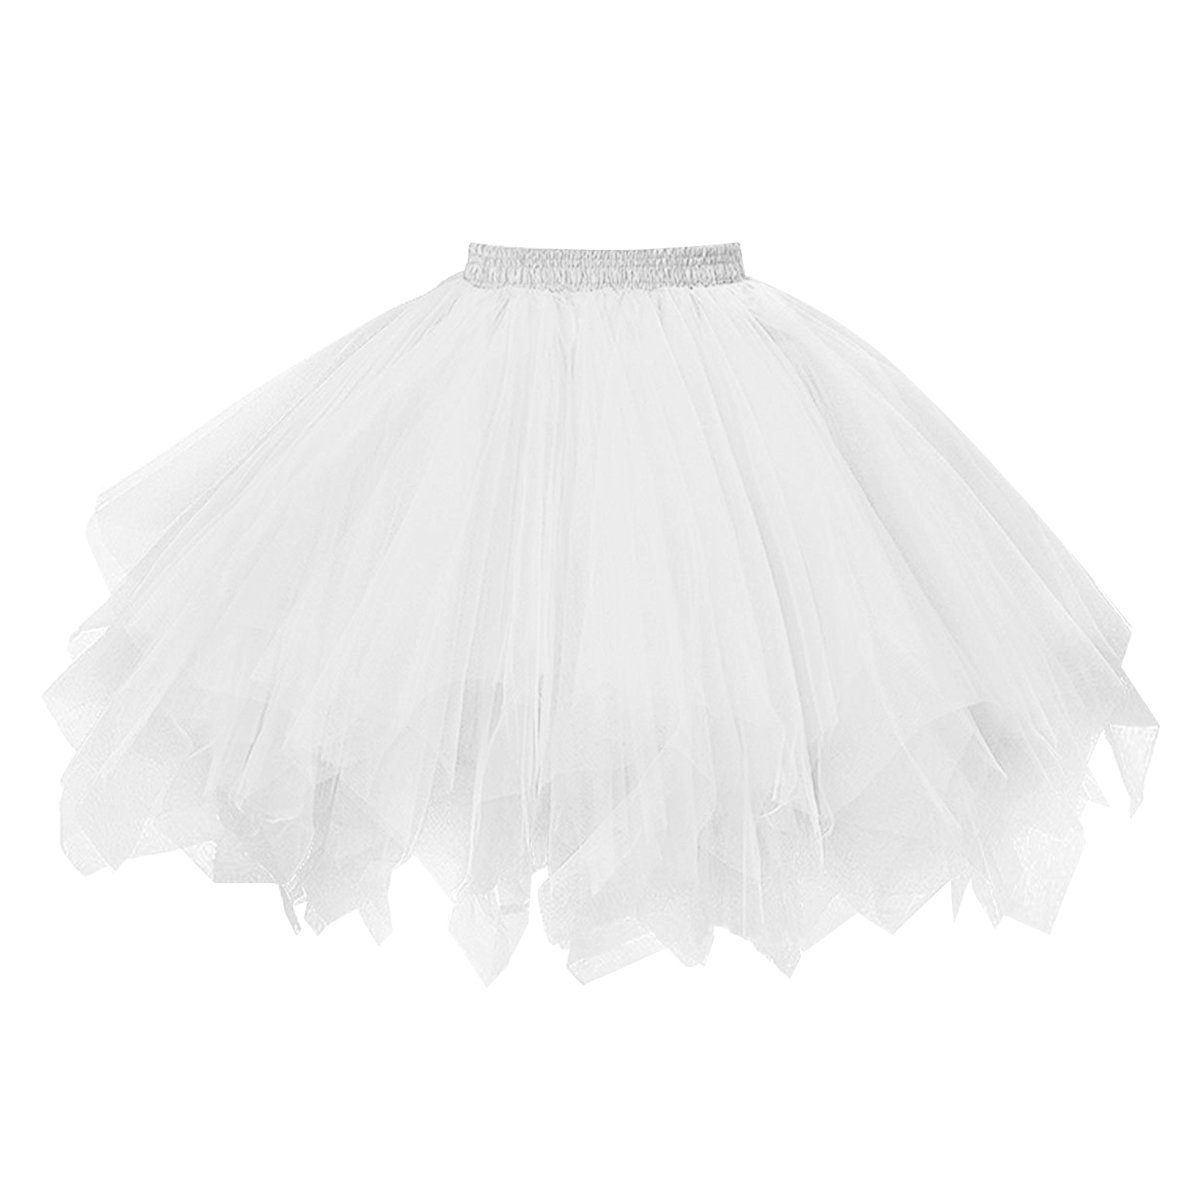 Vintage Tutu Petticoat